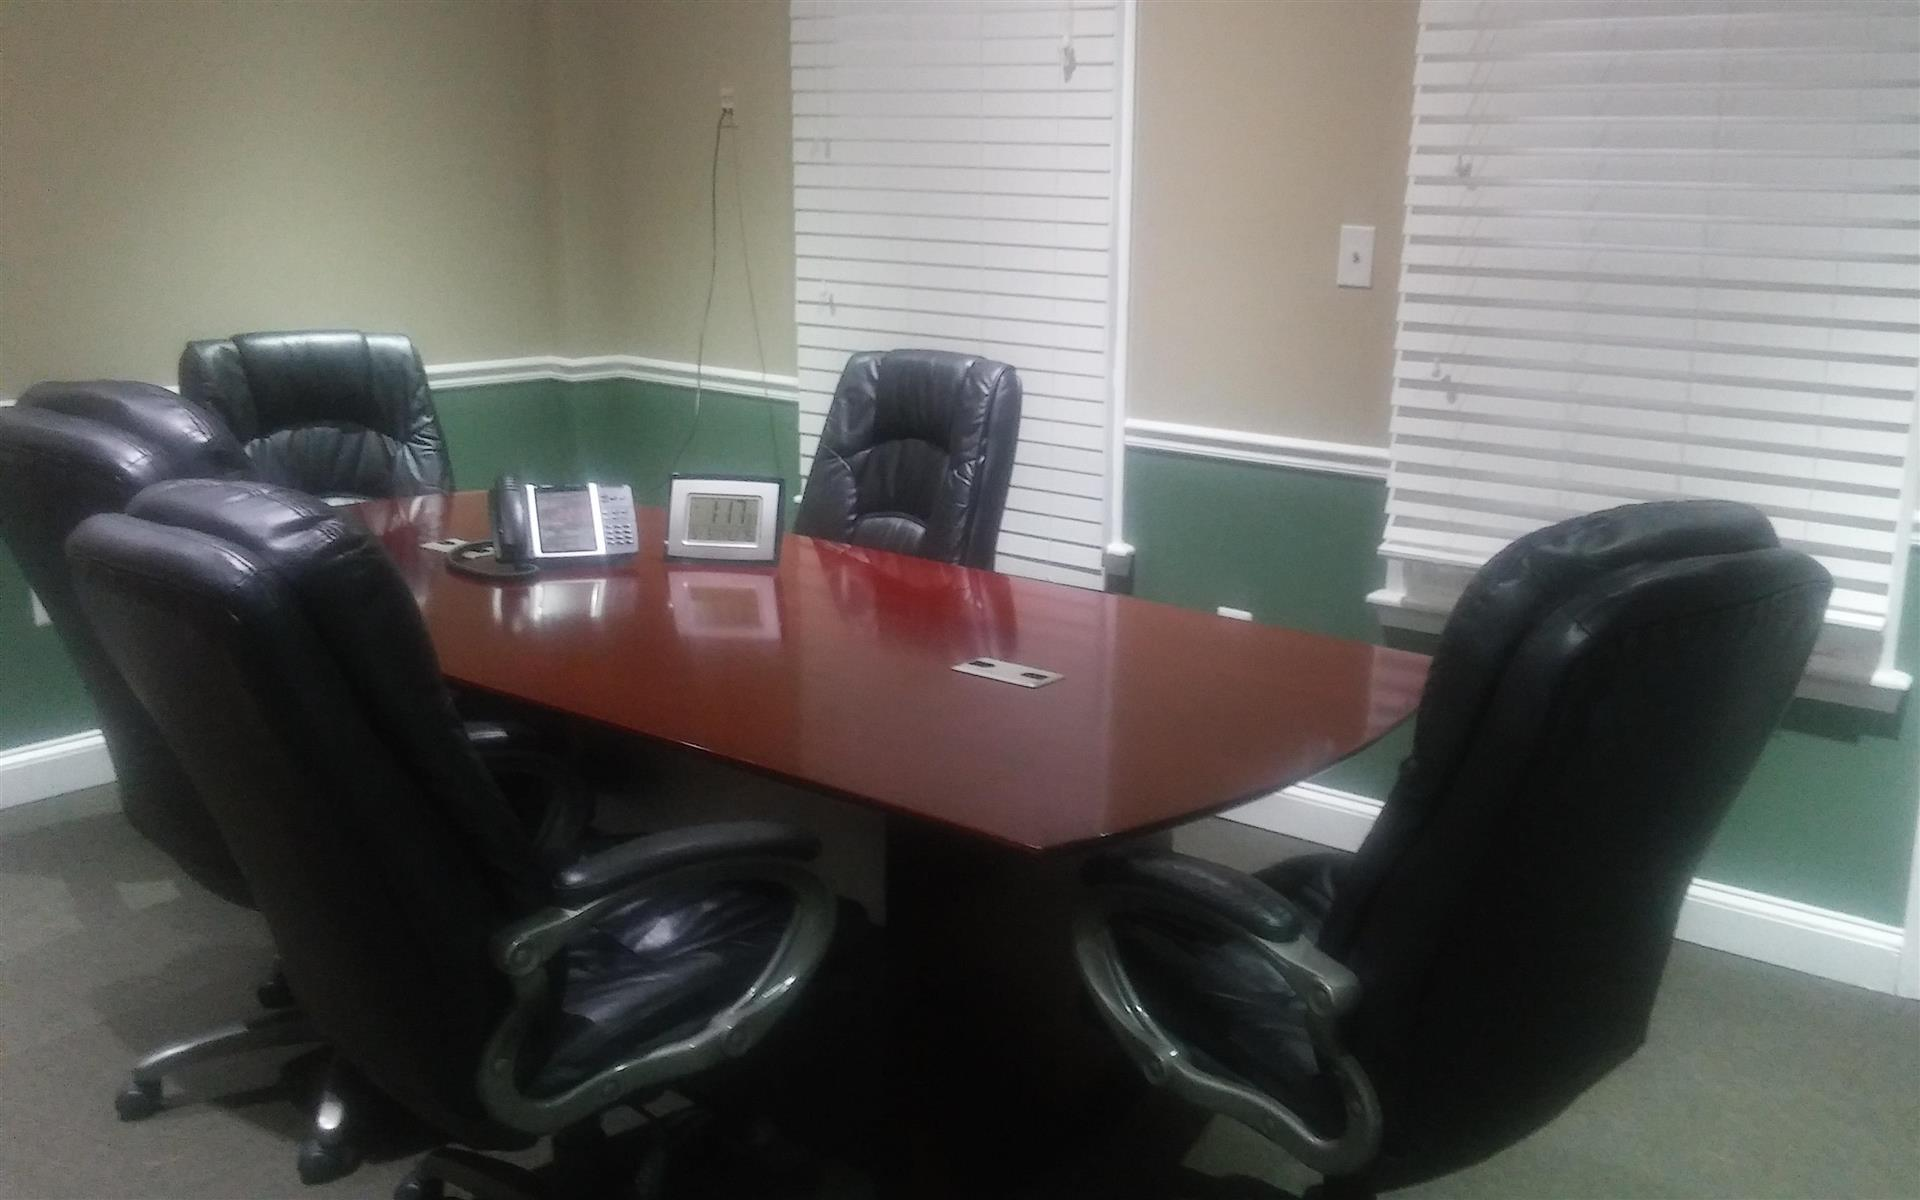 College Park Condo - Conference Room